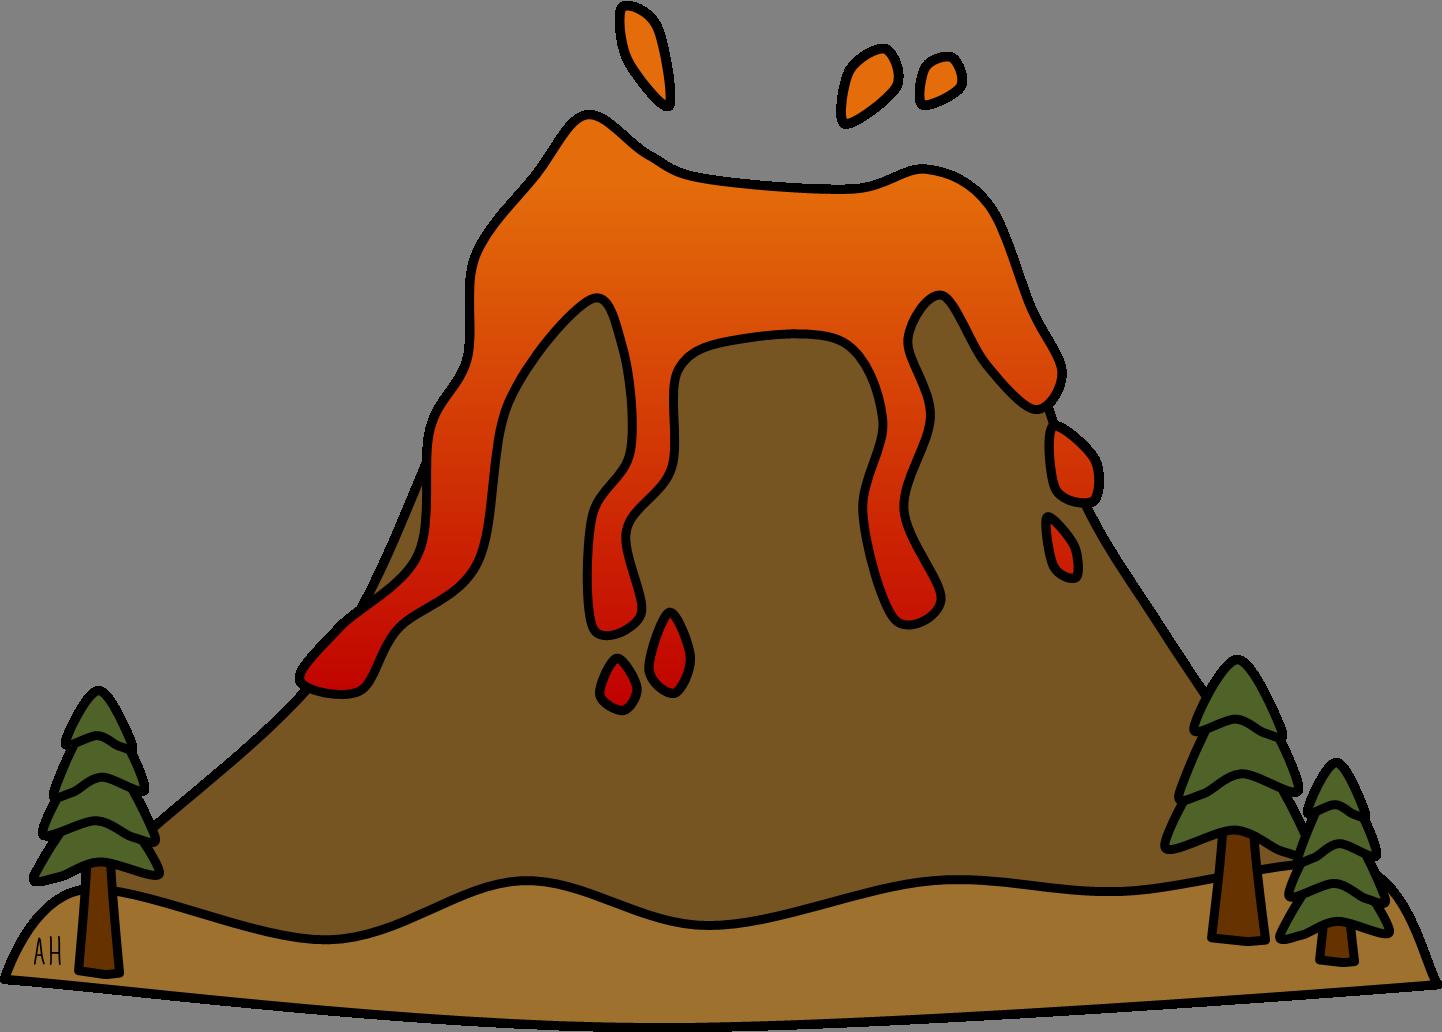 Earthquake clipart volcano, Earthquake volcano Transparent.